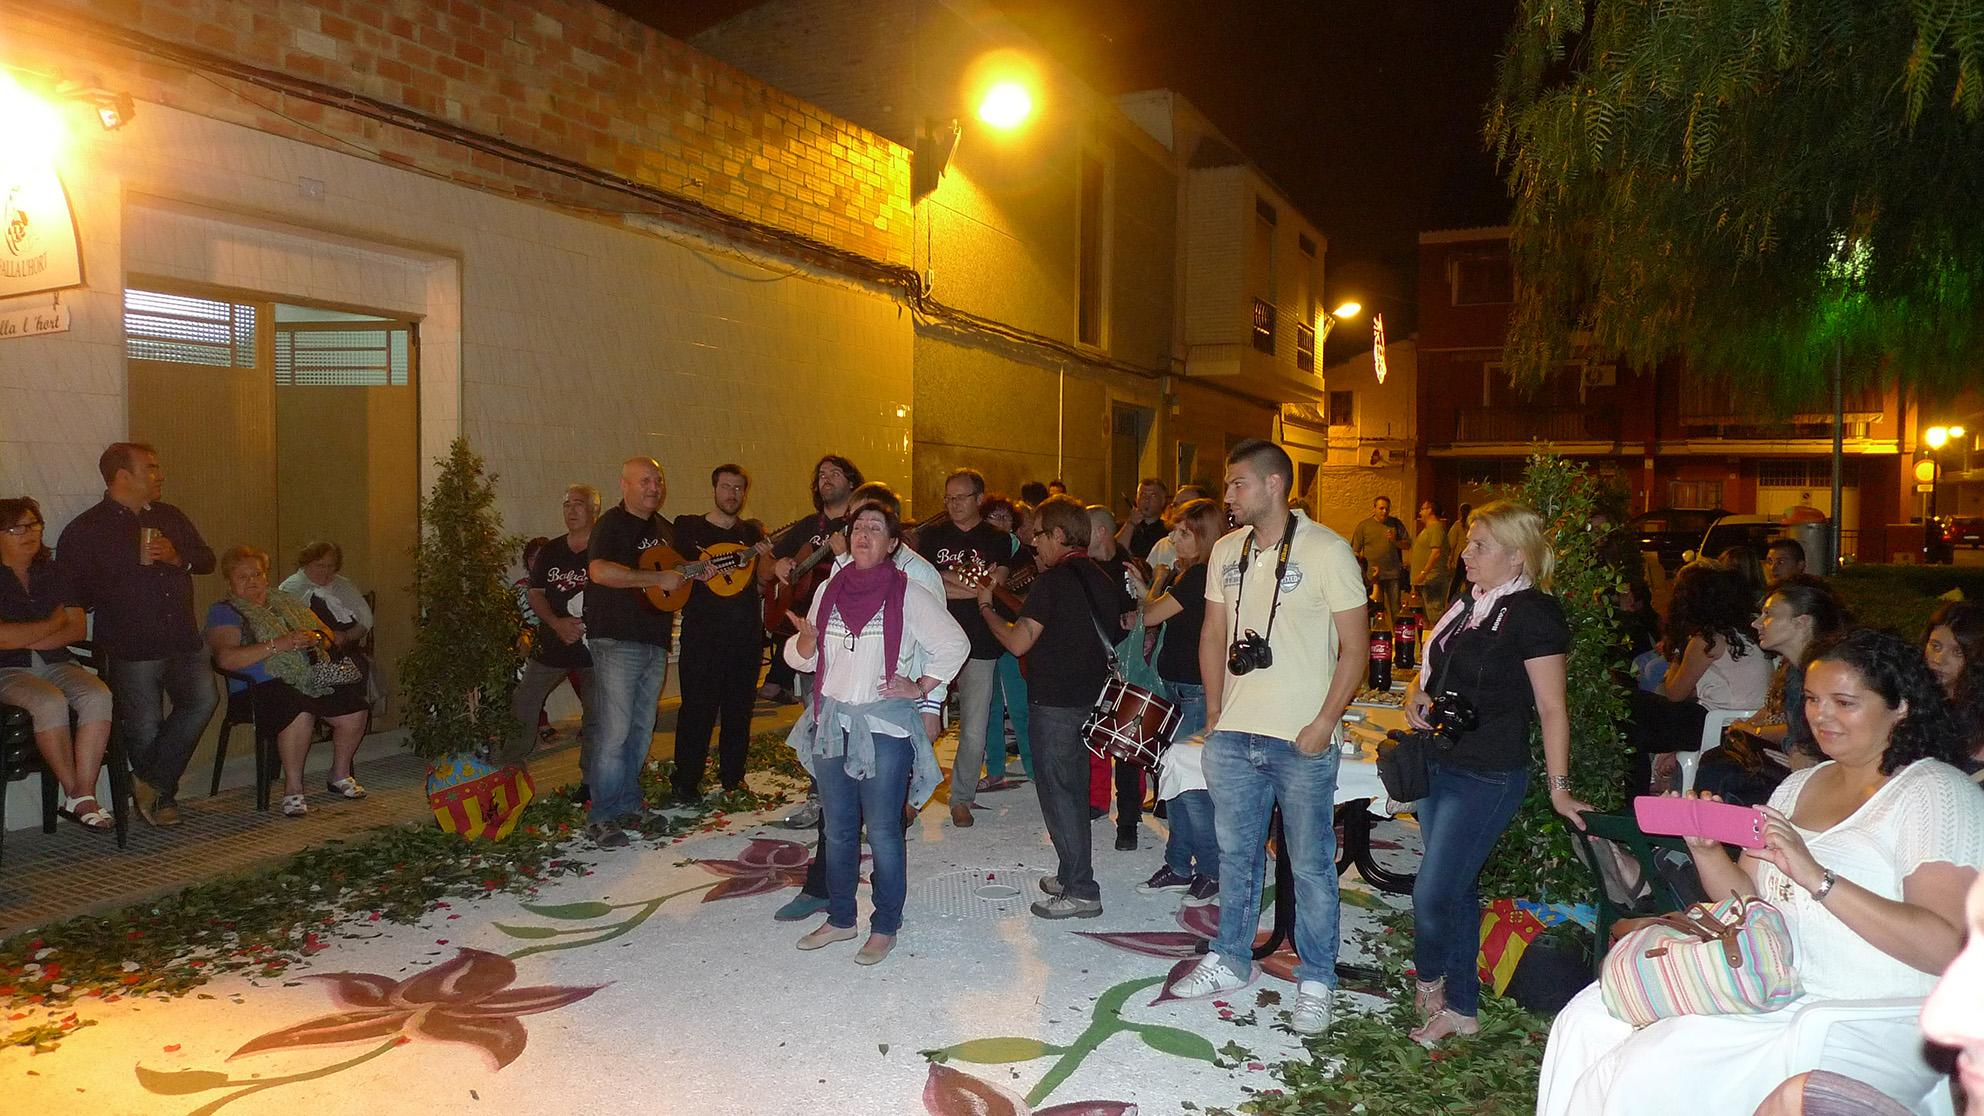 2014-06-07-Albaes d'Albal-Desemparats07 (52)